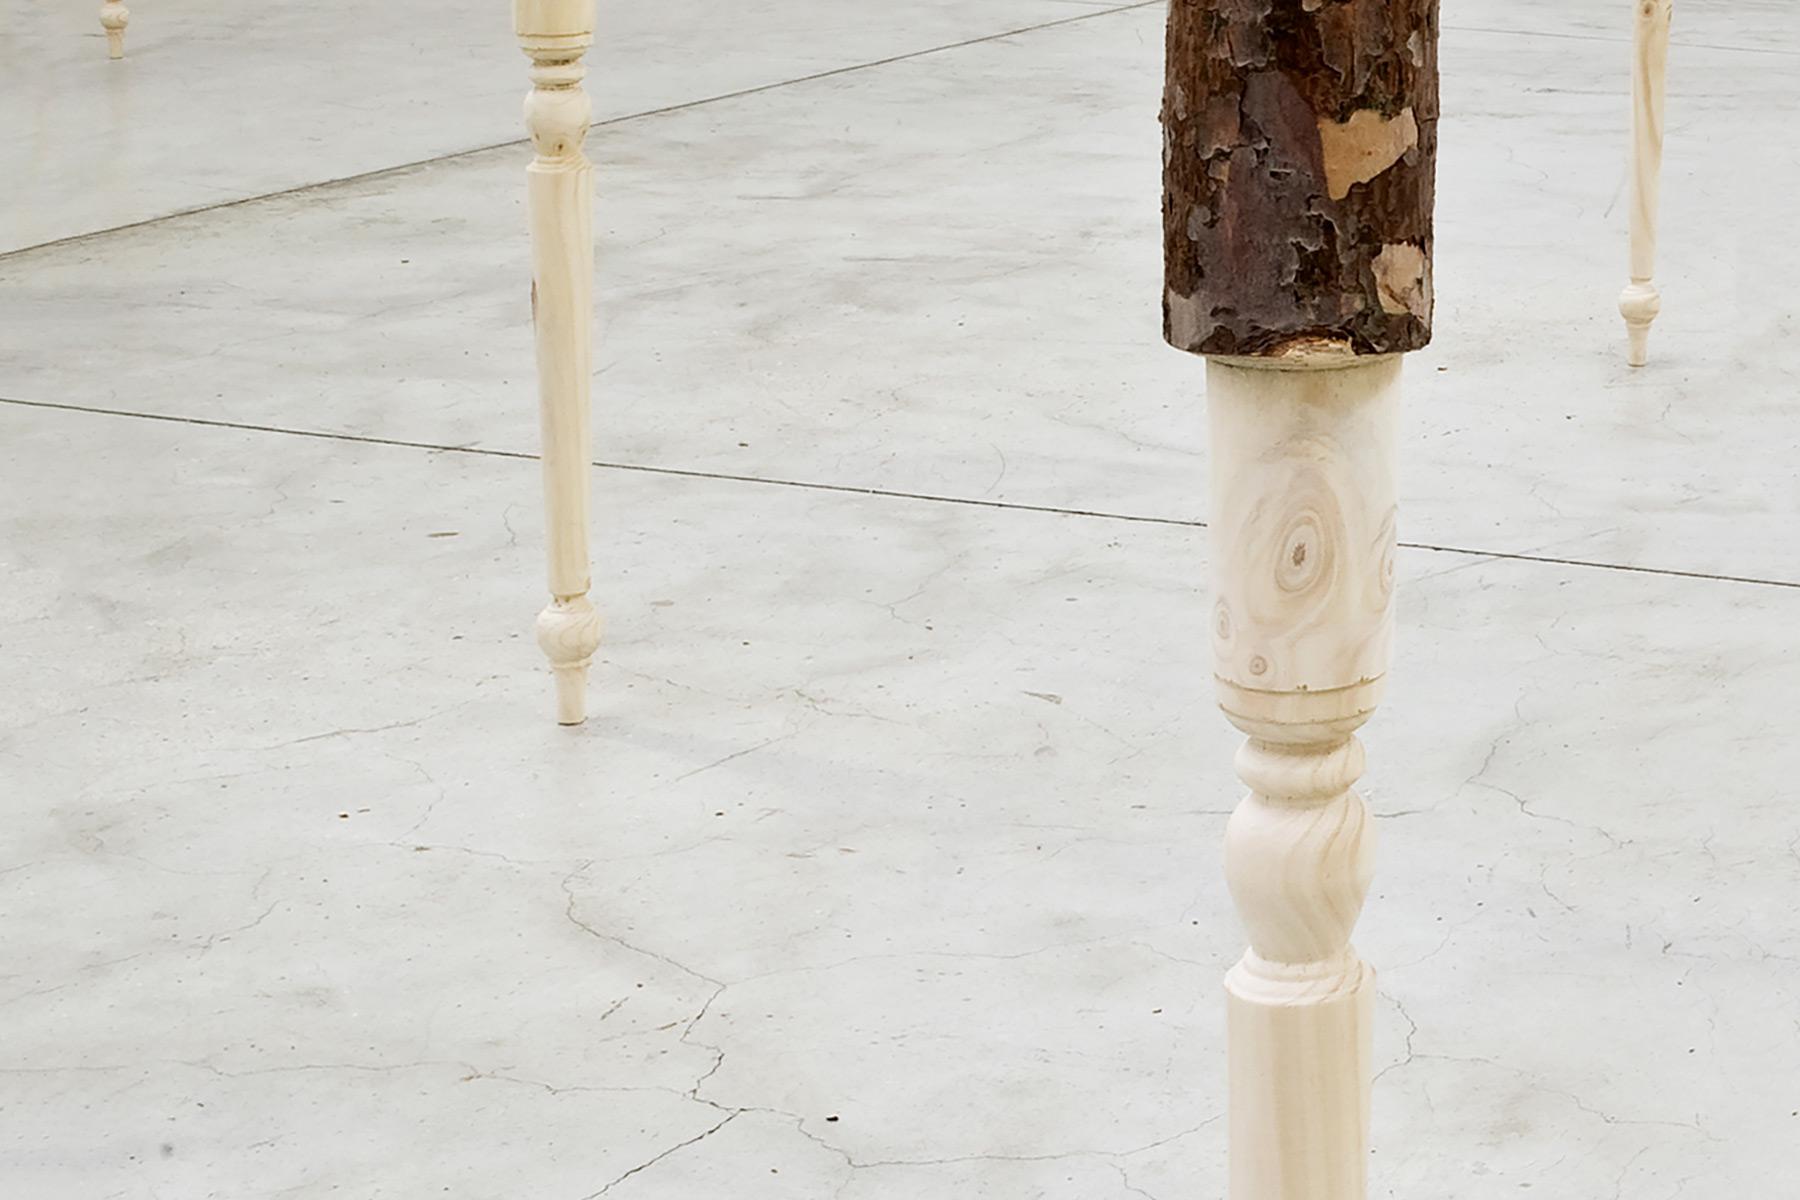 alastair-mackie-copse-2011-All Visual Arts